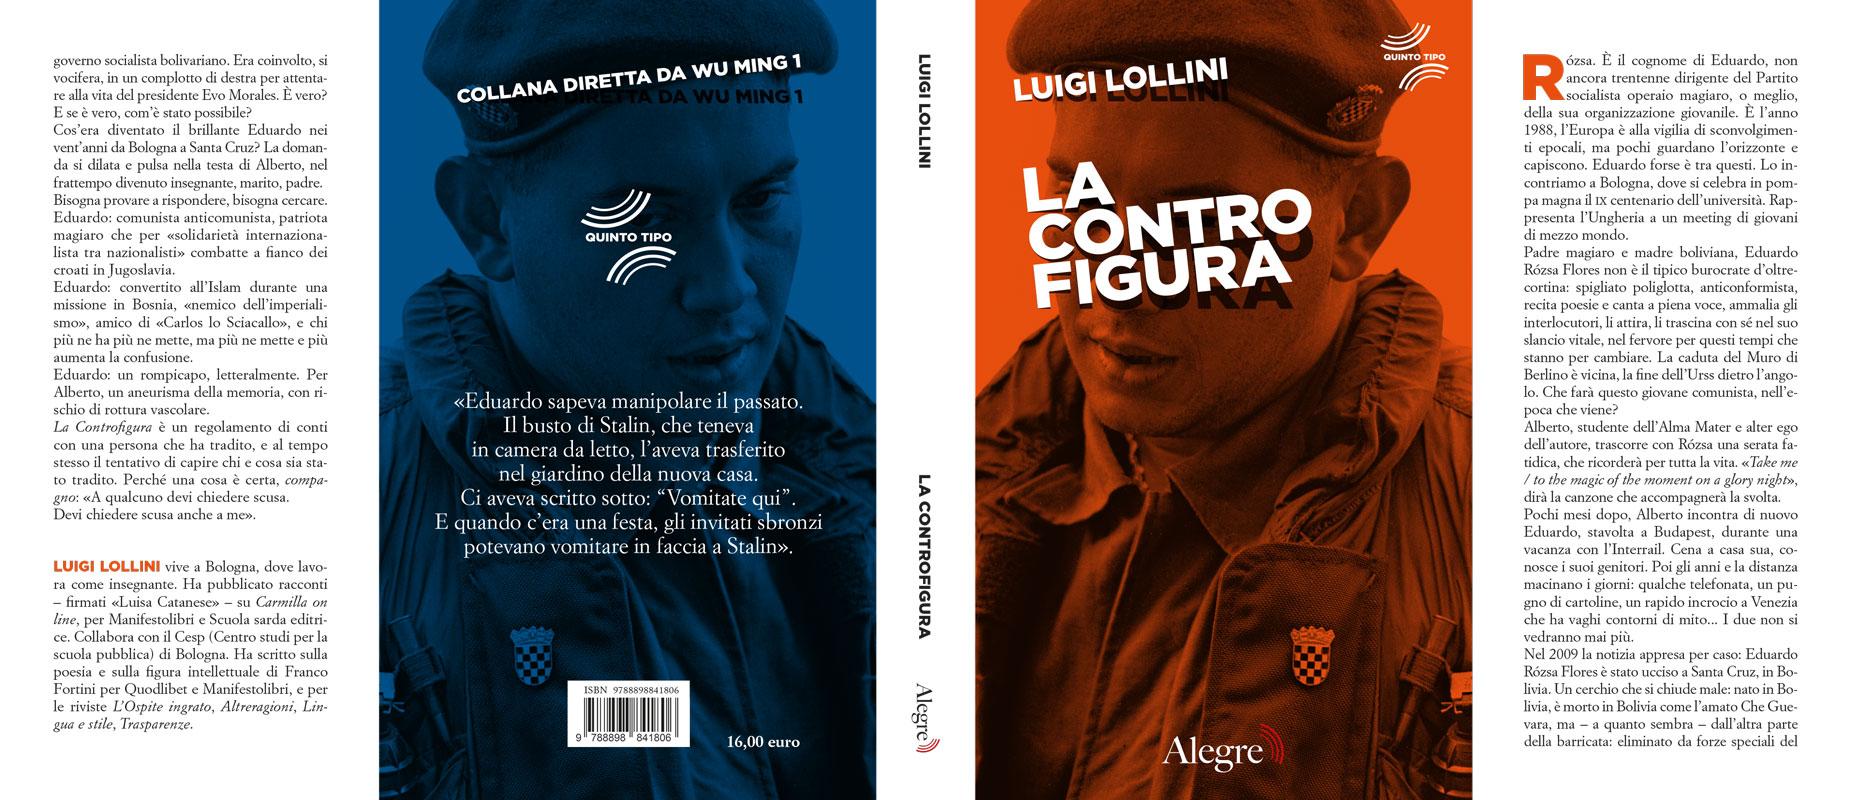 Luigi Lollini, La Controfigura, stesa